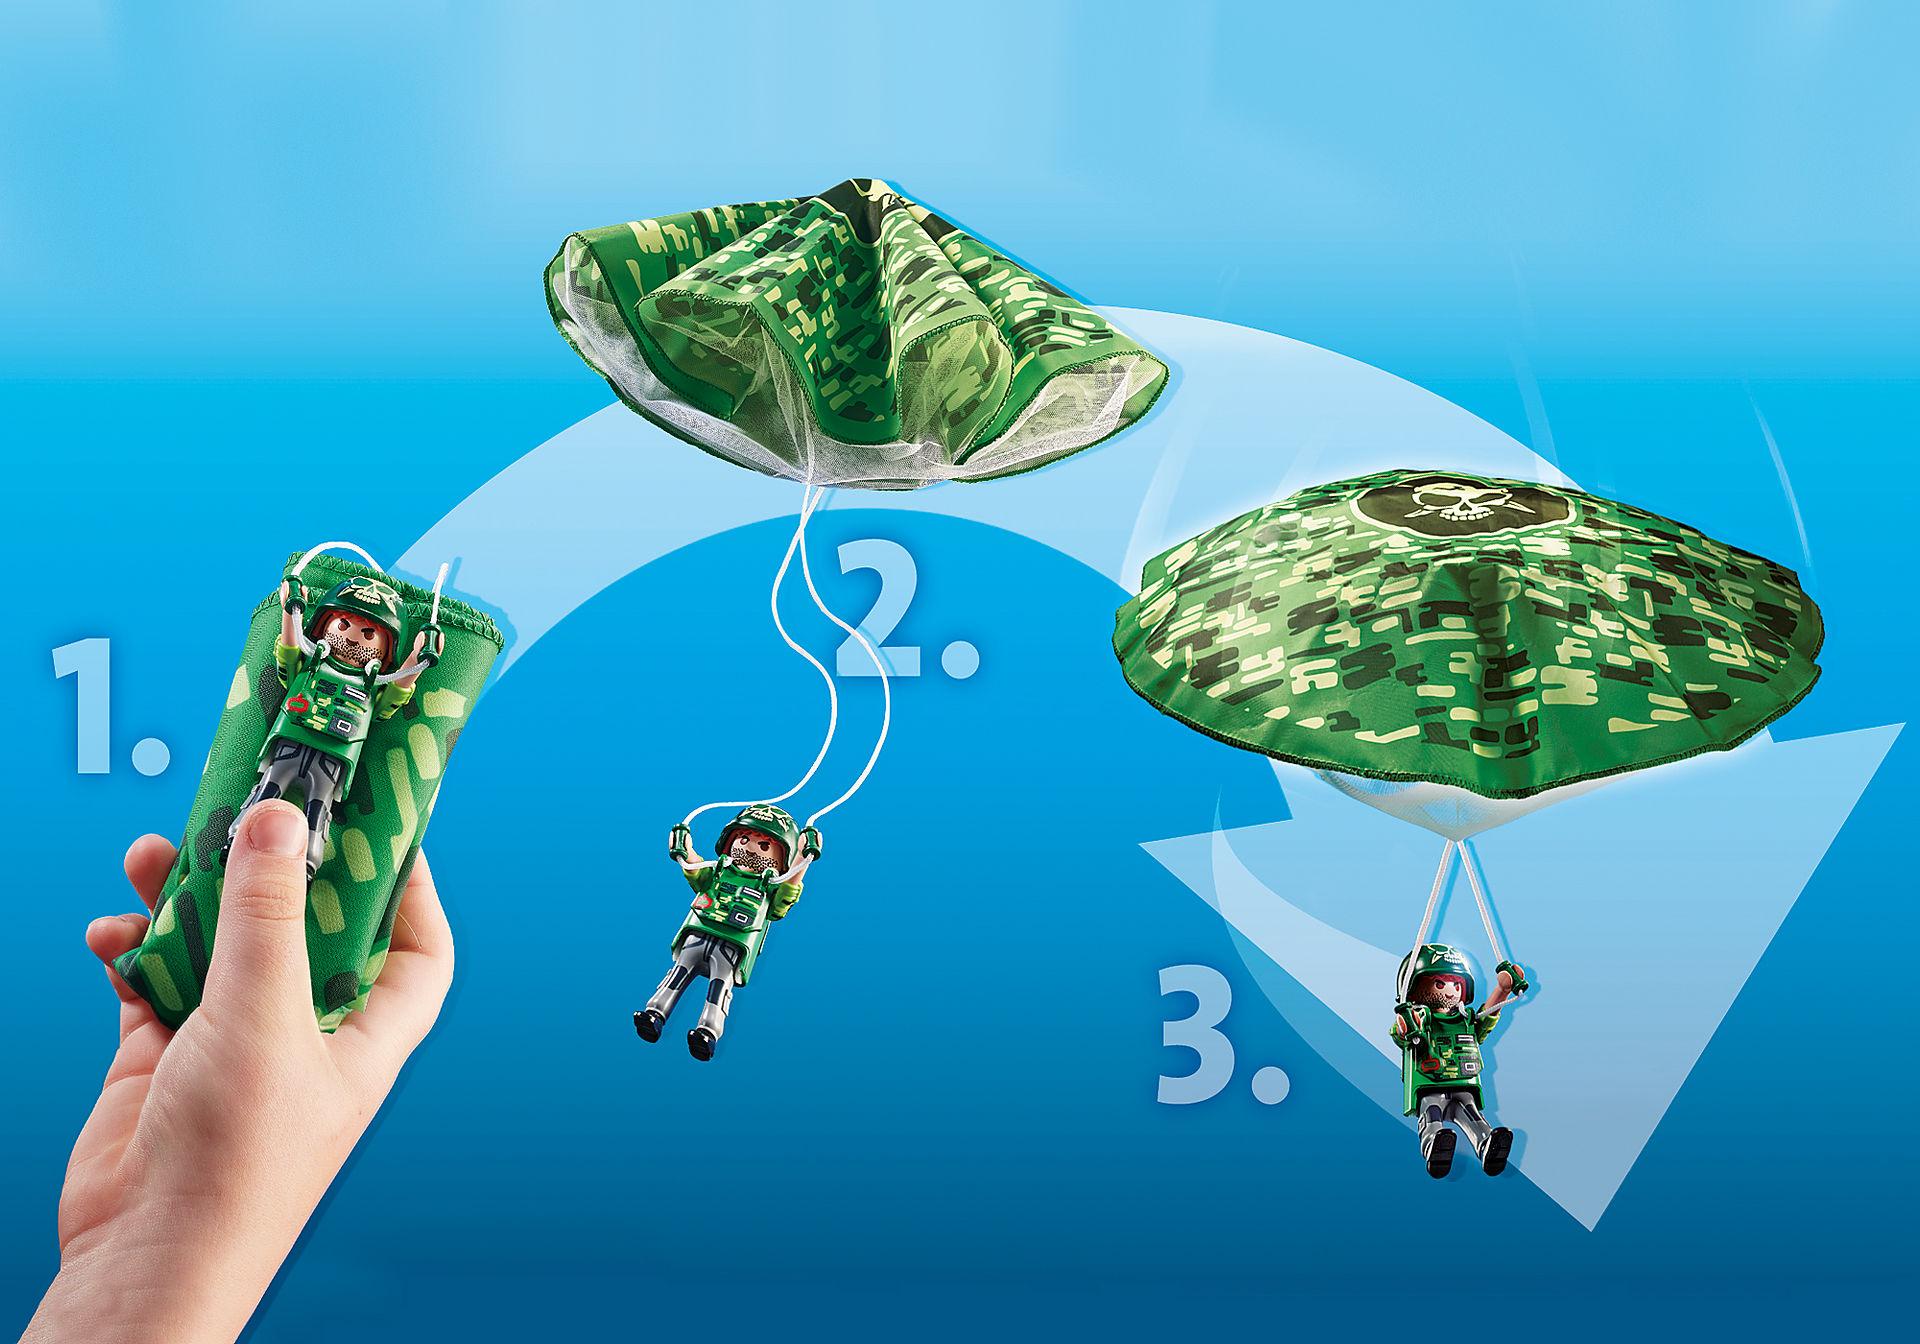 70569 Politiehelikopter: parachute-achtervolging zoom image5